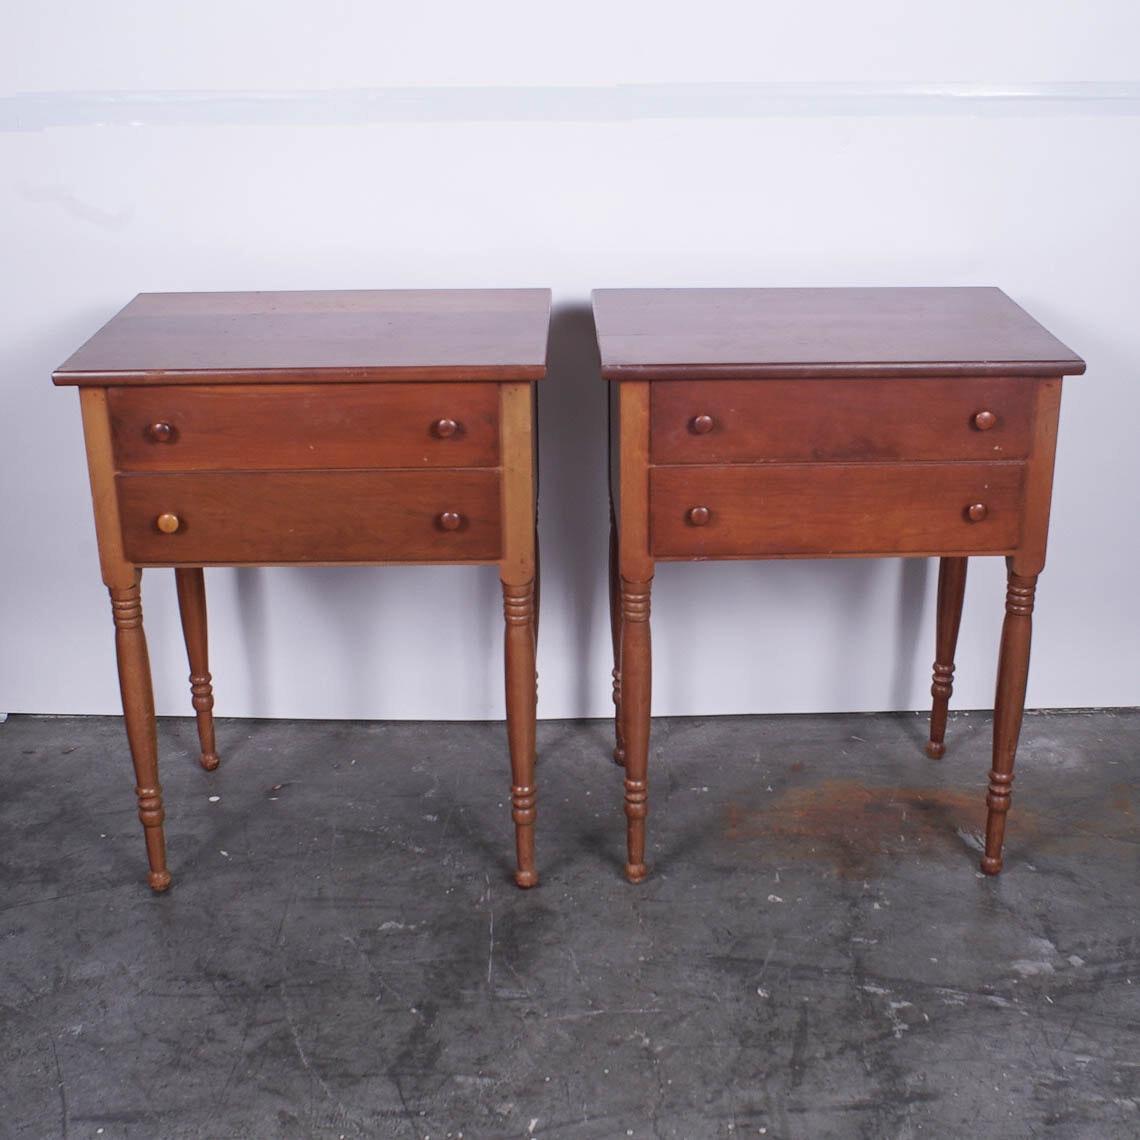 Pair of Vintage End Tables